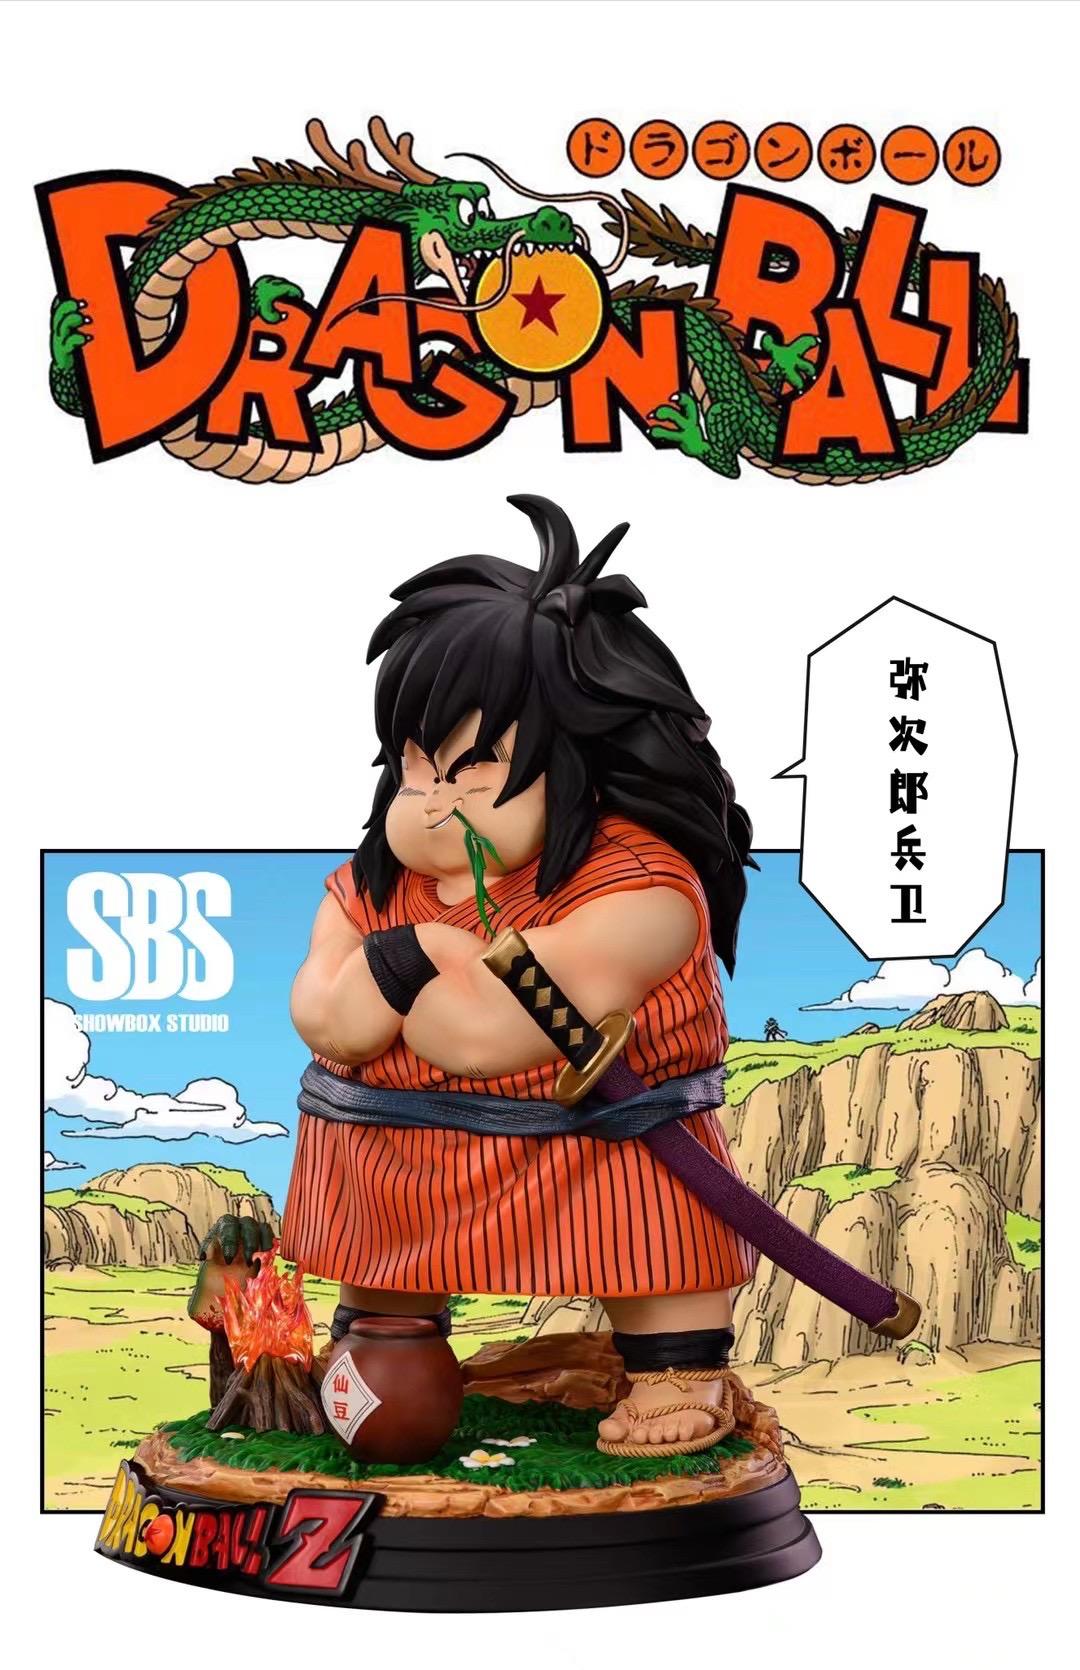 Yajirobe ยาจิโรเบ้ by SBS (มัดจำ)